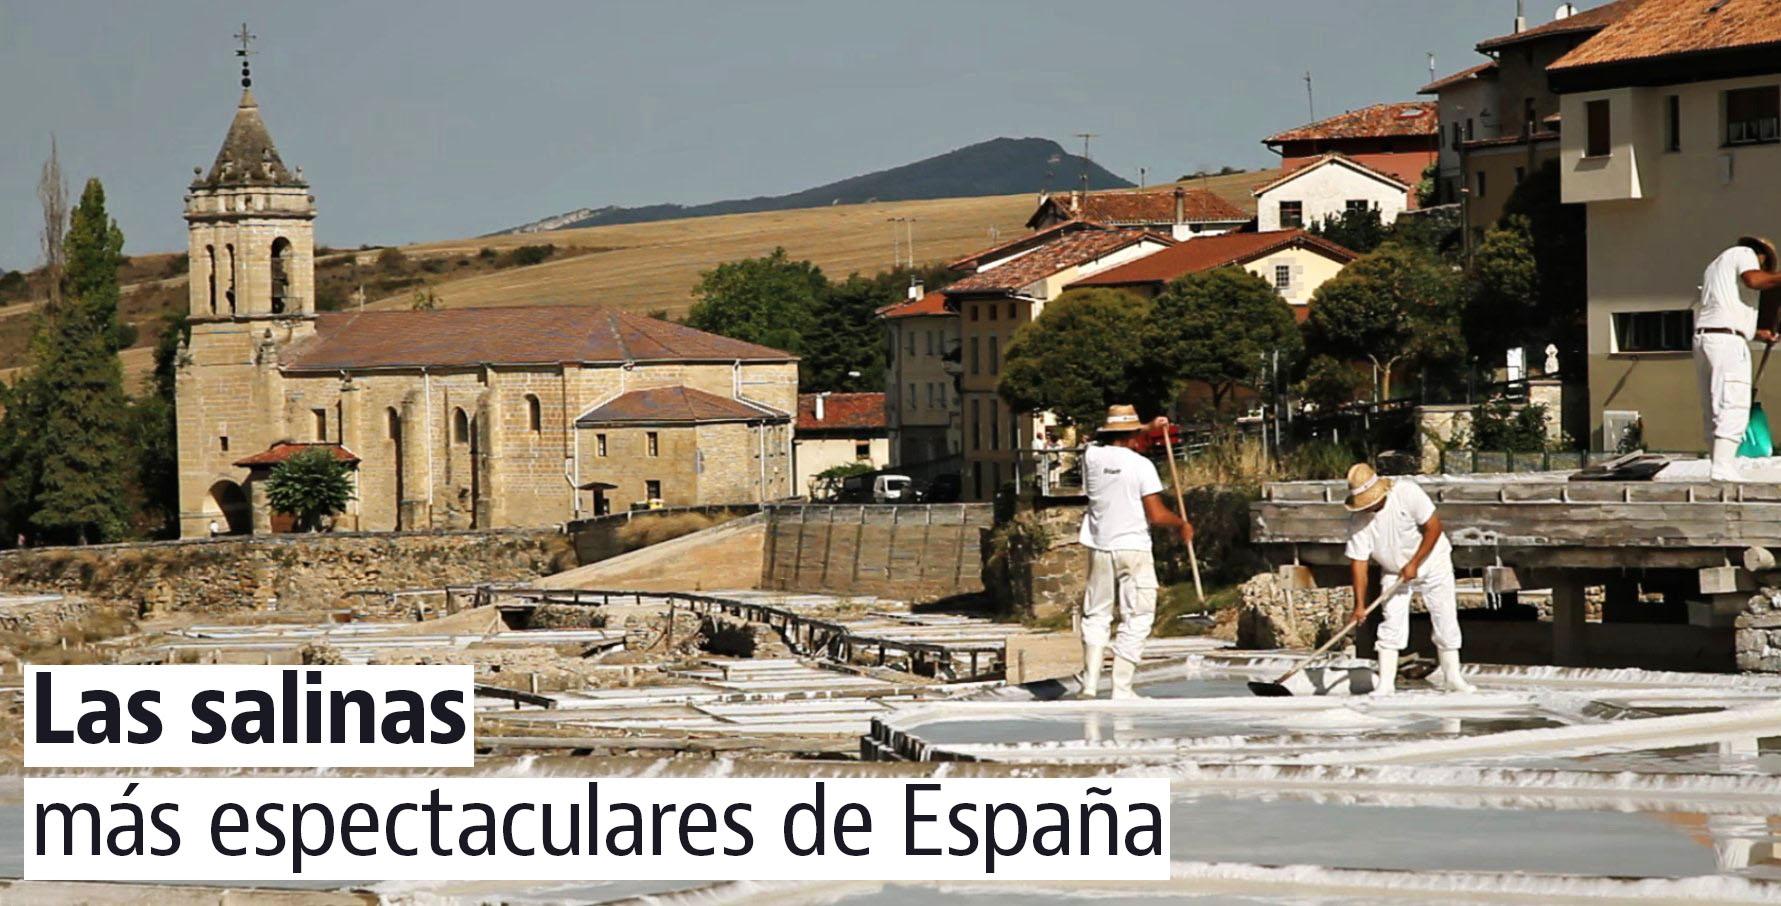 Las Salinas de Añana (Álava)